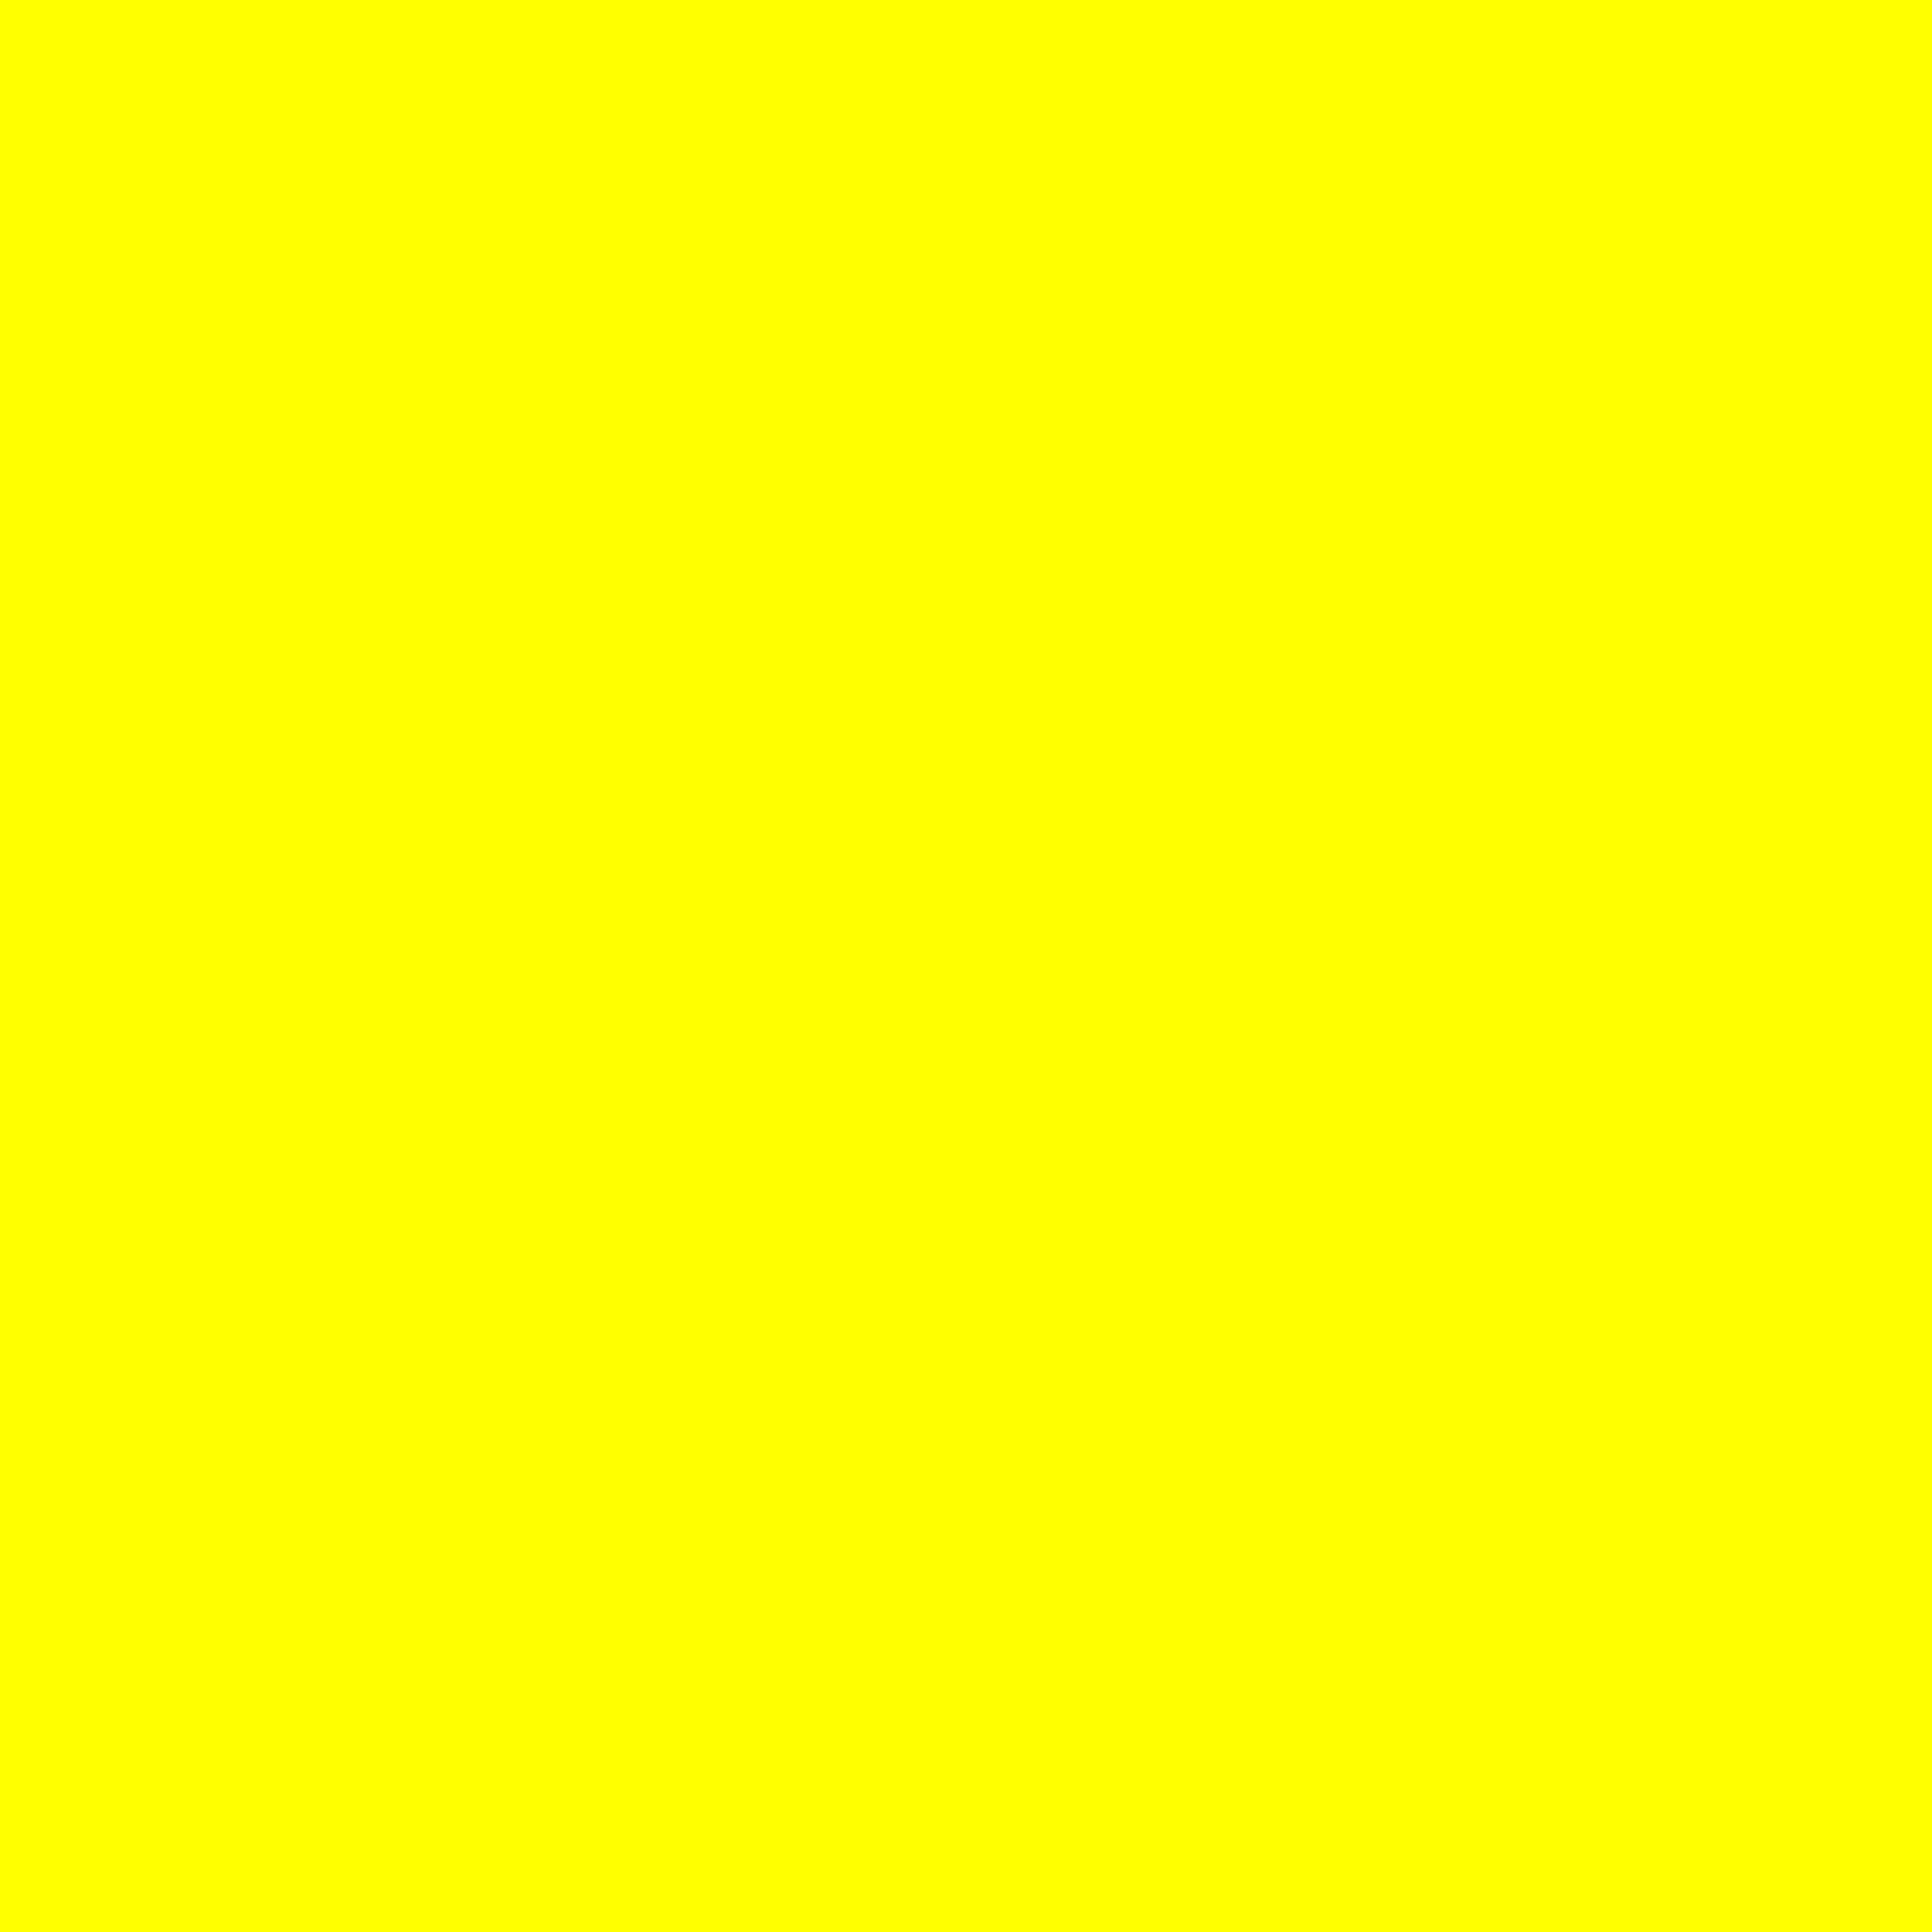 Square clipart yellow Color Yellow Clip Color Art